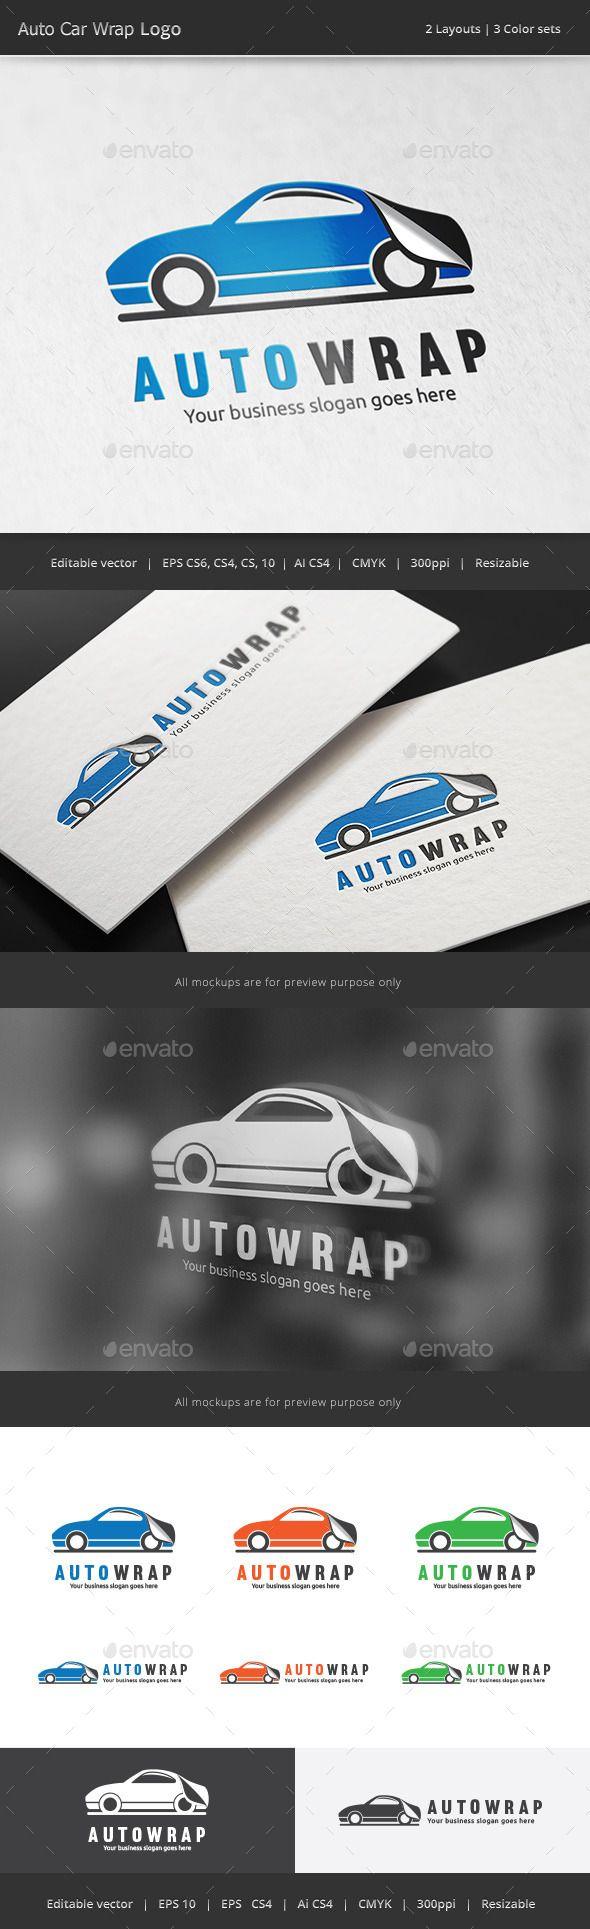 Car sticker design download - Car Sticker Wrap Logo